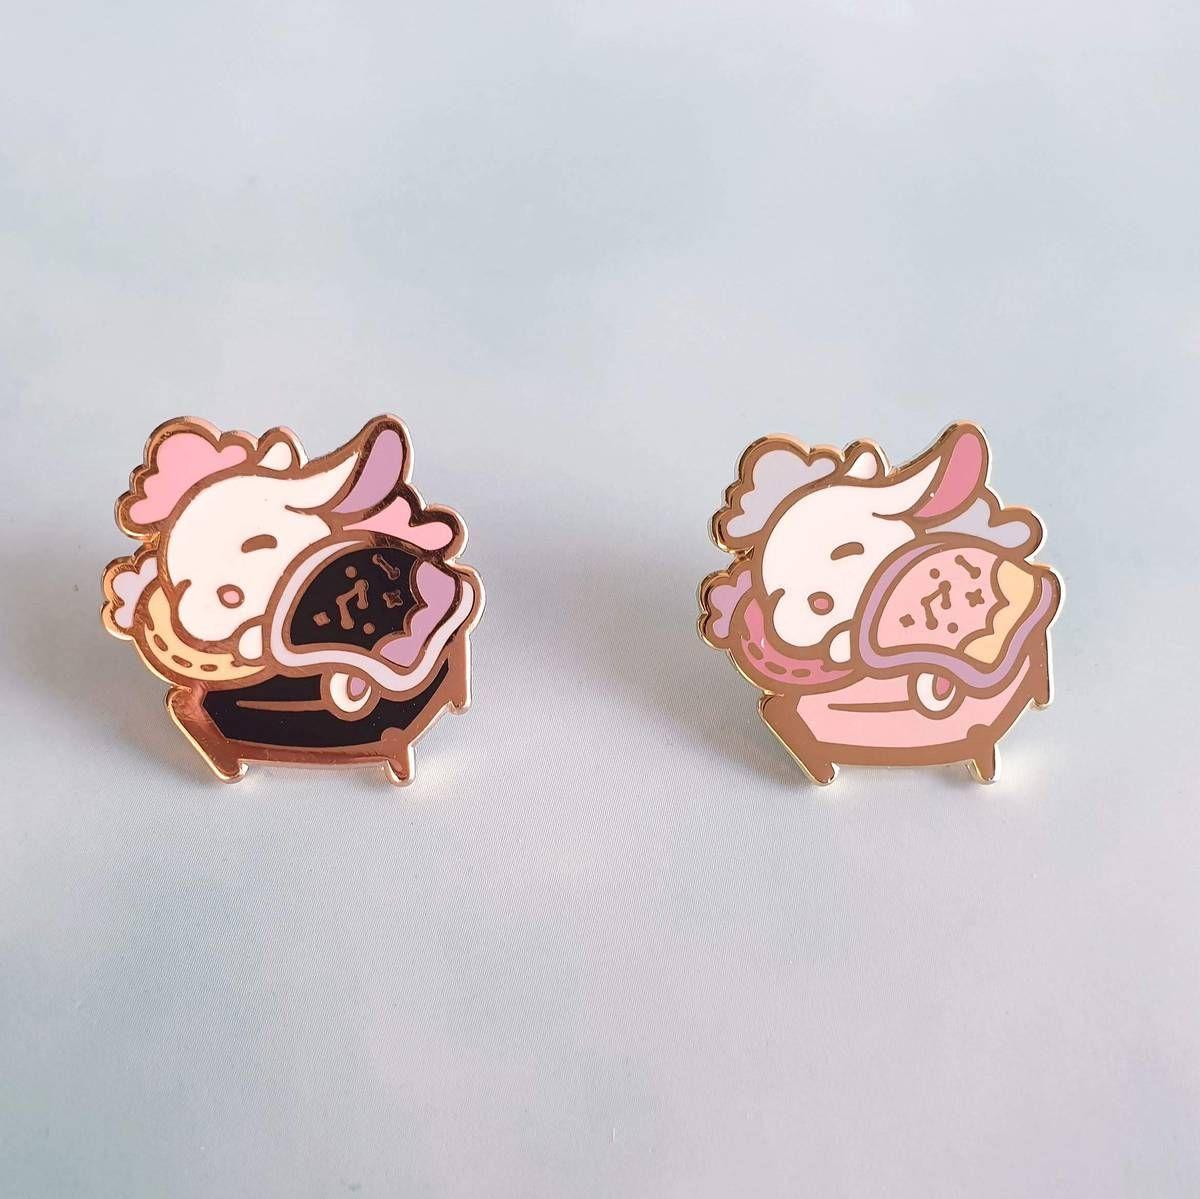 Gold Plated Brooch Unique Gift Set SET OF FOUR Cat Enamel Pins Cute Pets Lapel Pins